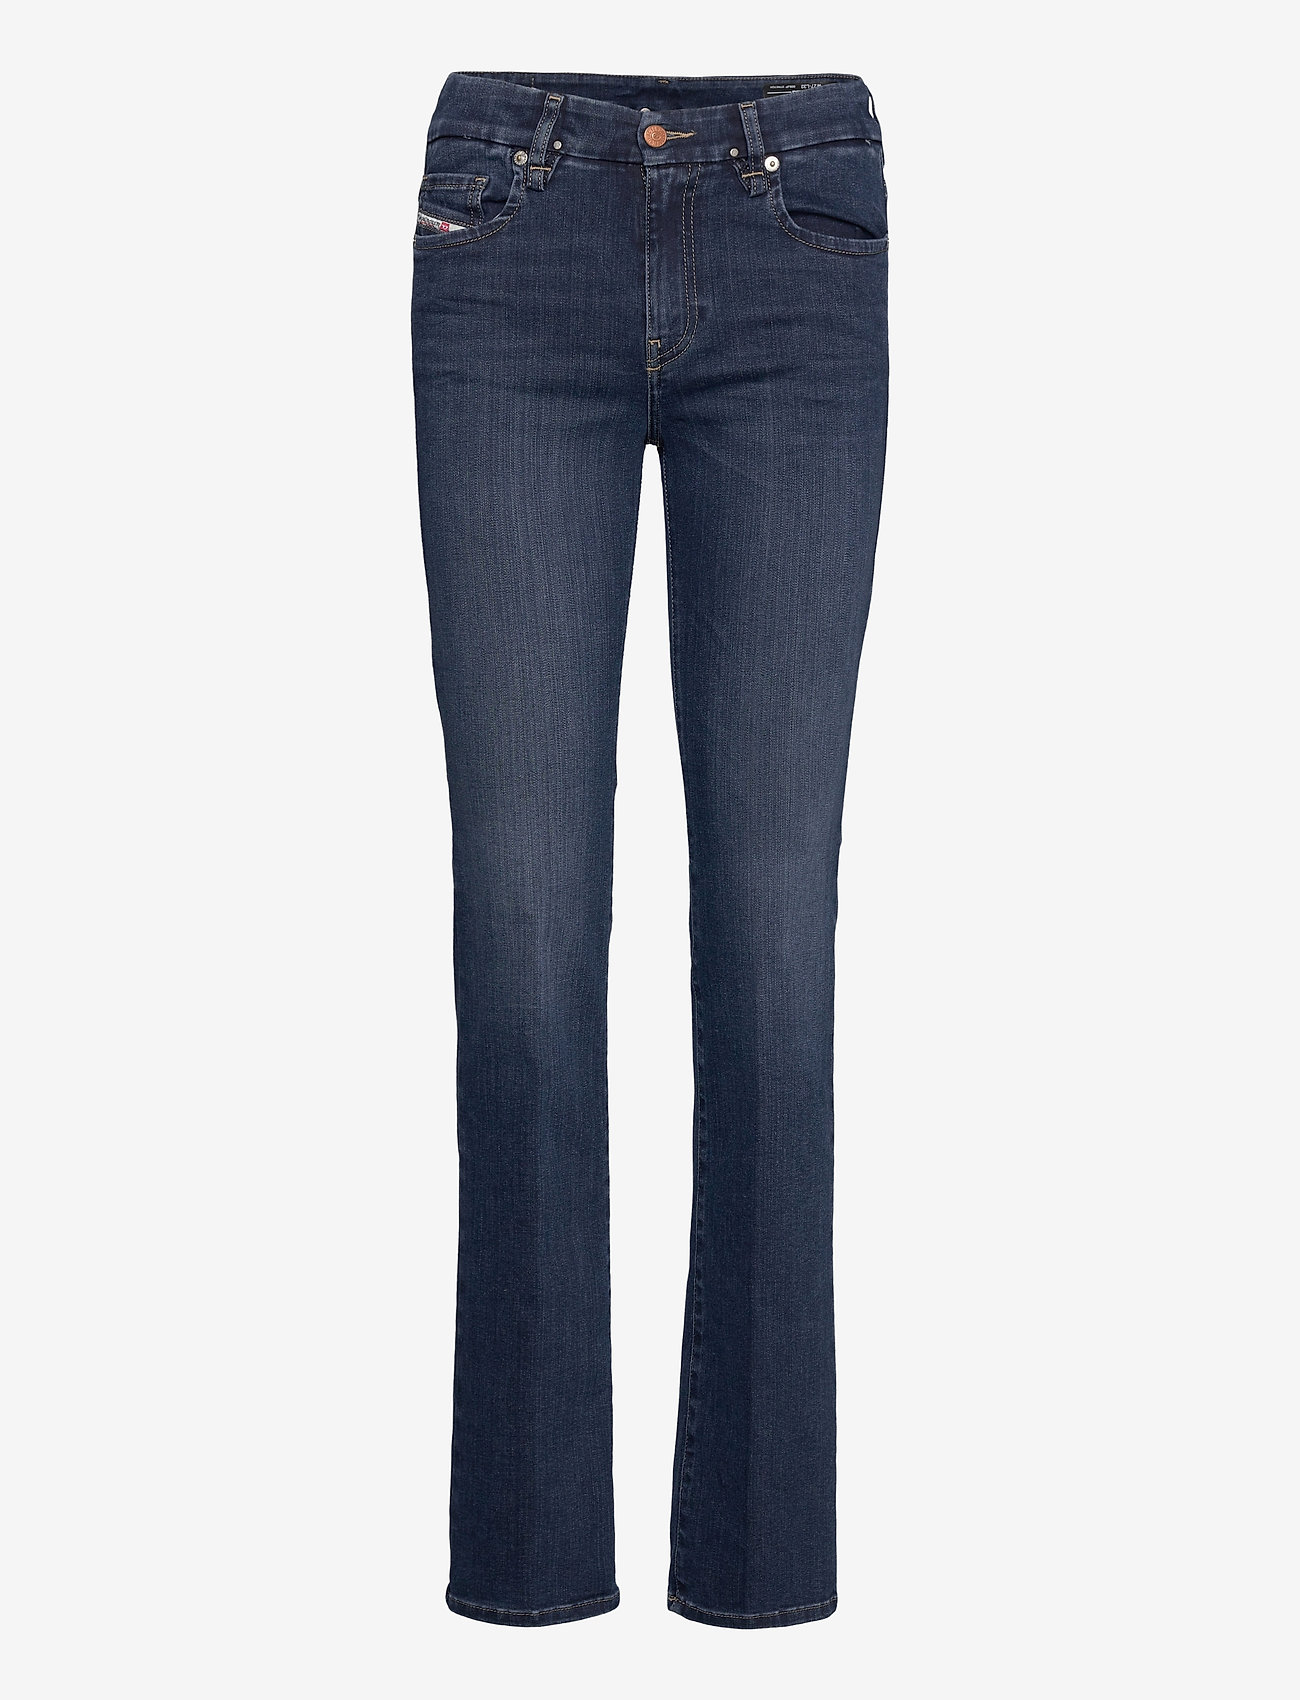 Diesel Women - D-SLANDY-B - slim jeans - blue denim - 0